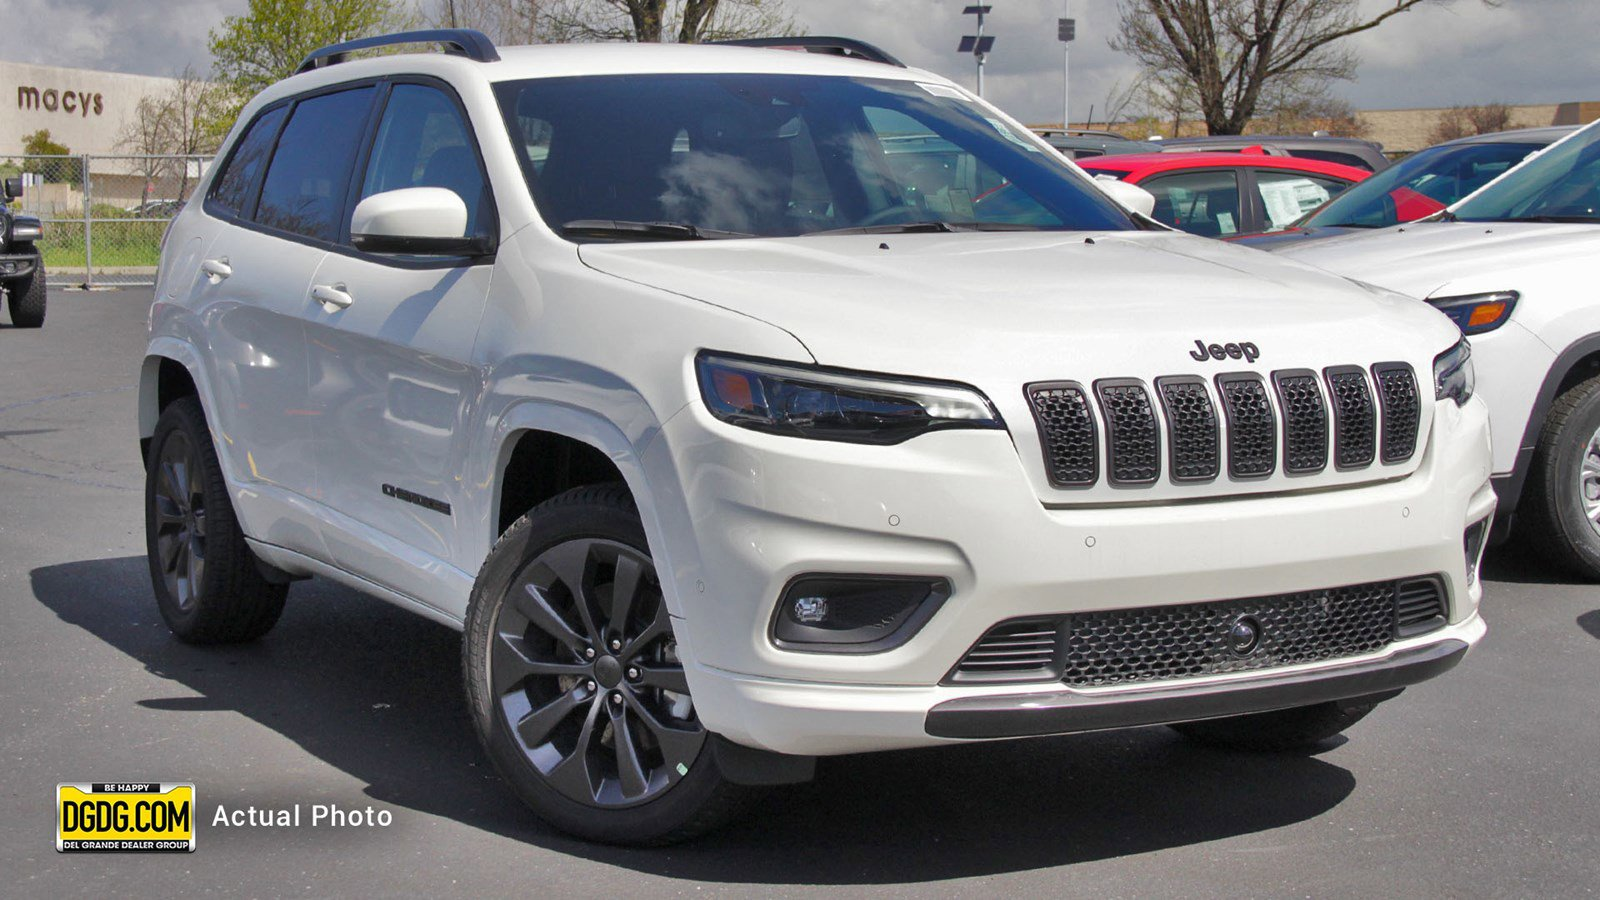 "2019 Jeep<br/><span class=""vdp-trim"">Cherokee High Altitude FWD Sport Utility</span>"